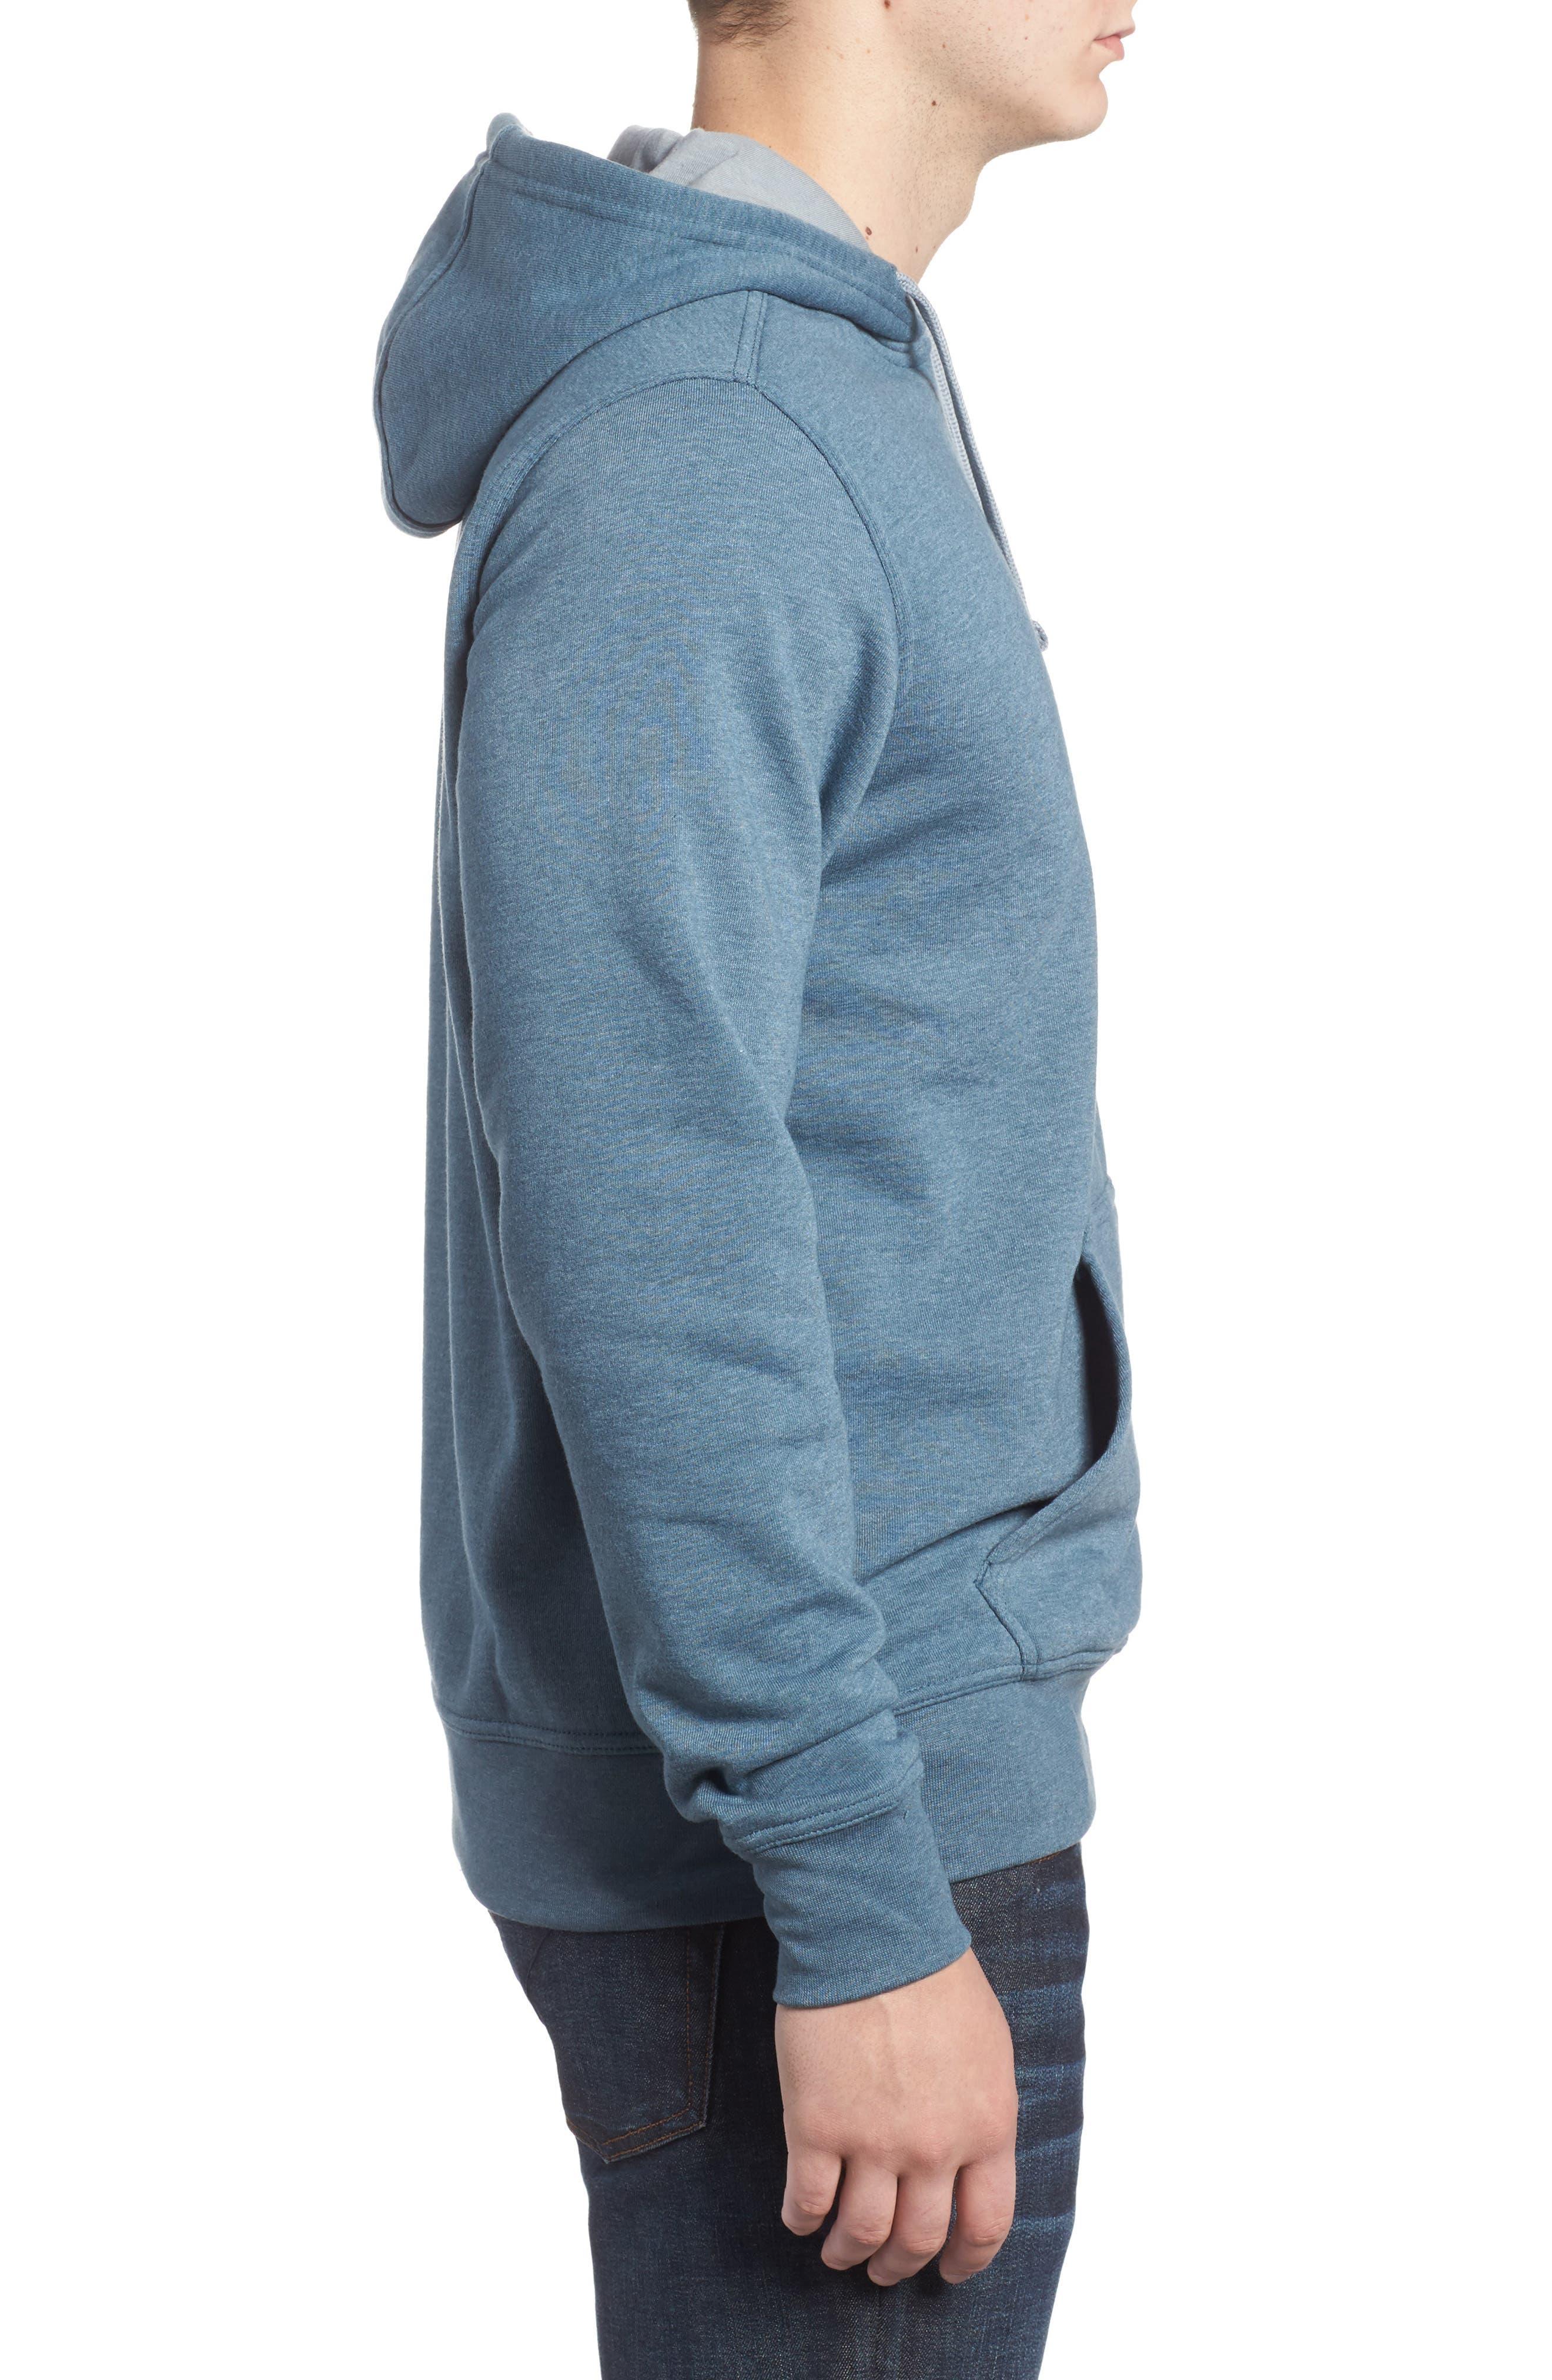 Half Dome Cotton Blend Hoodie,                             Alternate thumbnail 3, color,                             Conquer Blue / Monument Grey